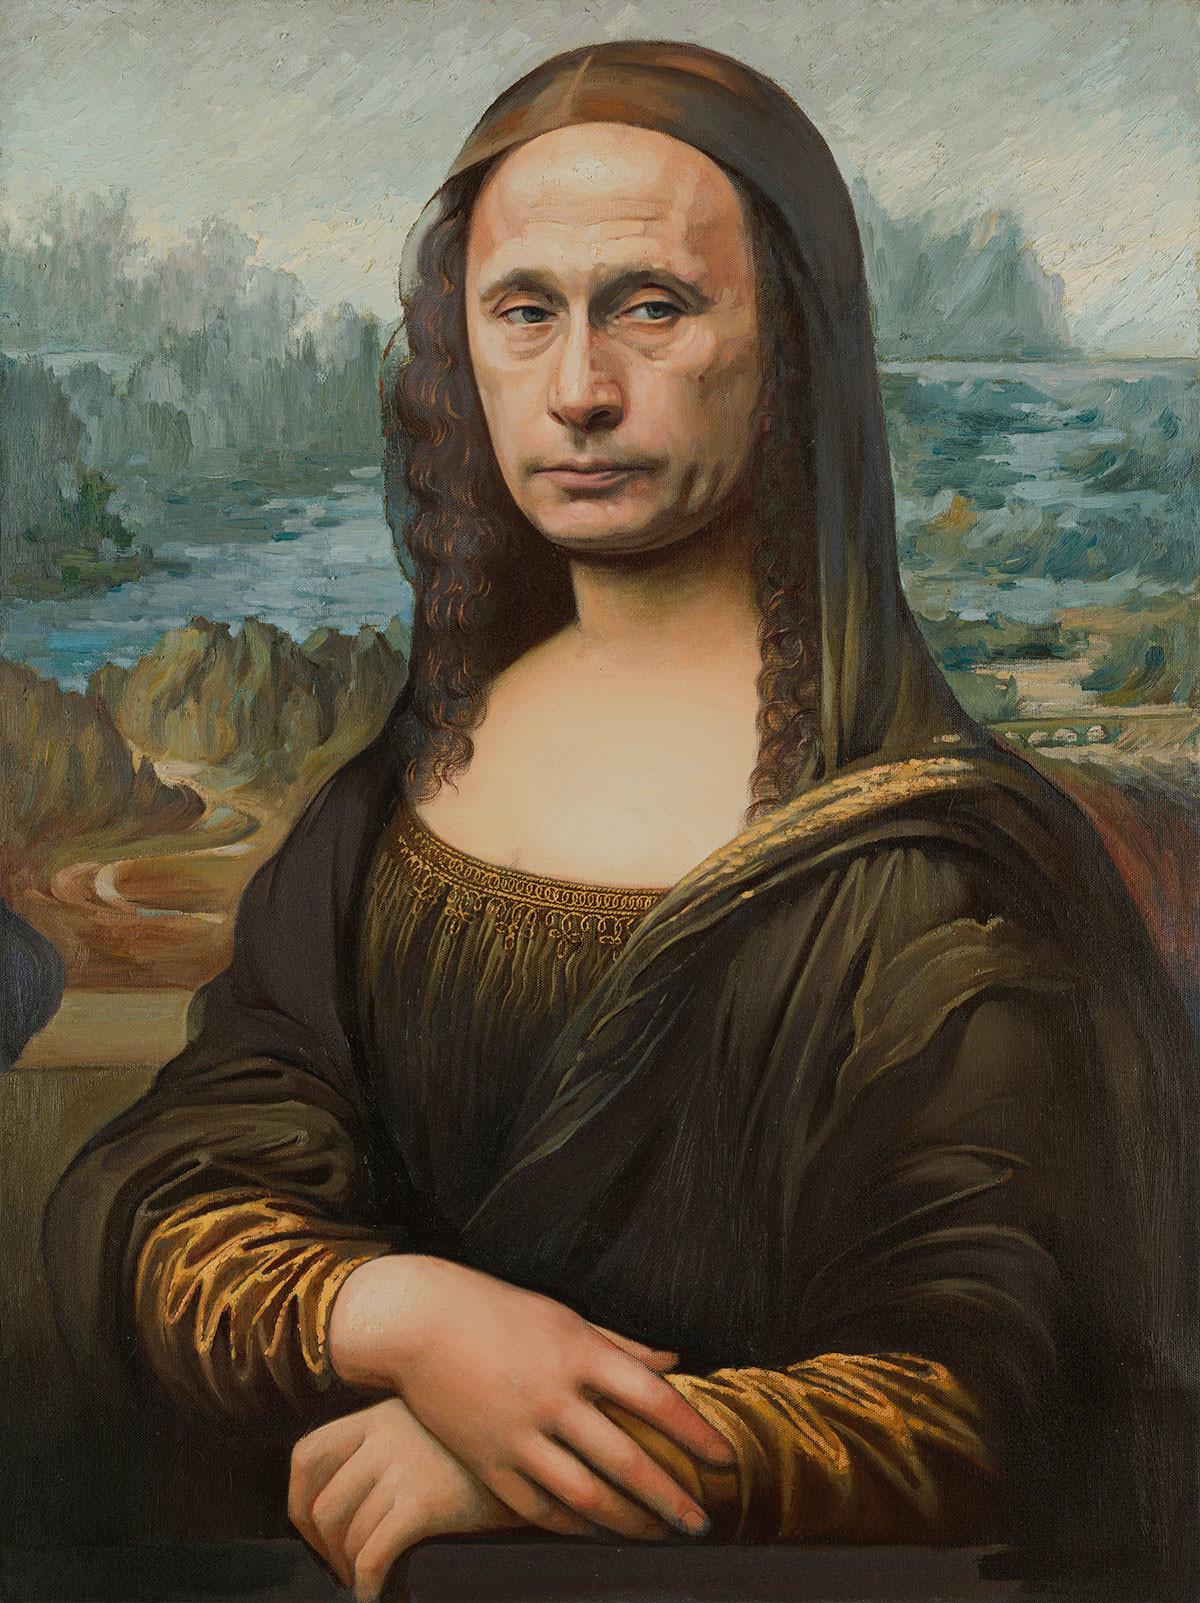 Aleksander Kosolapov. Mona Lisa, 2020.